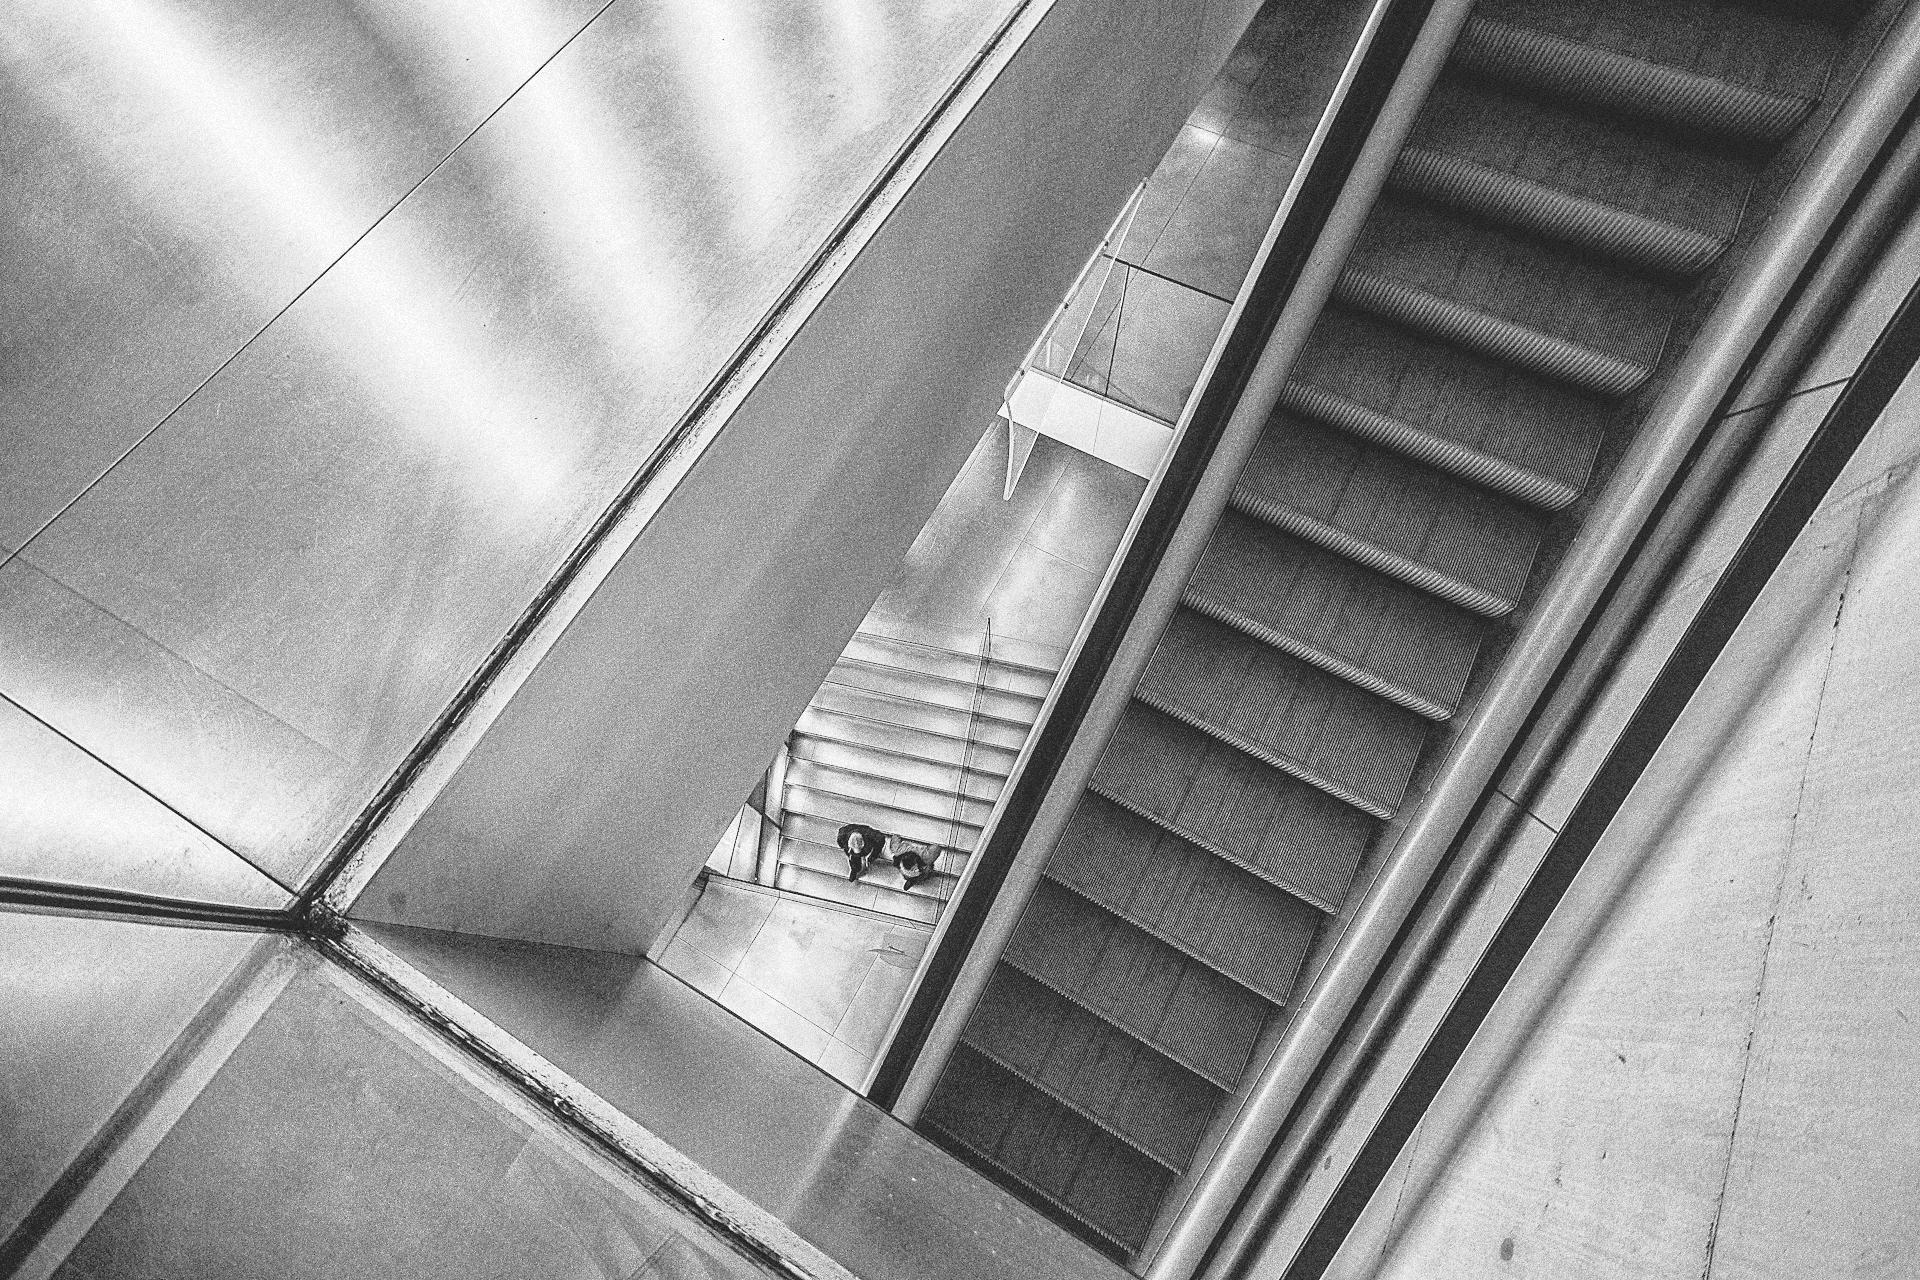 10AM Photography Fotografia bonjourmolotov Andre Gigante 22